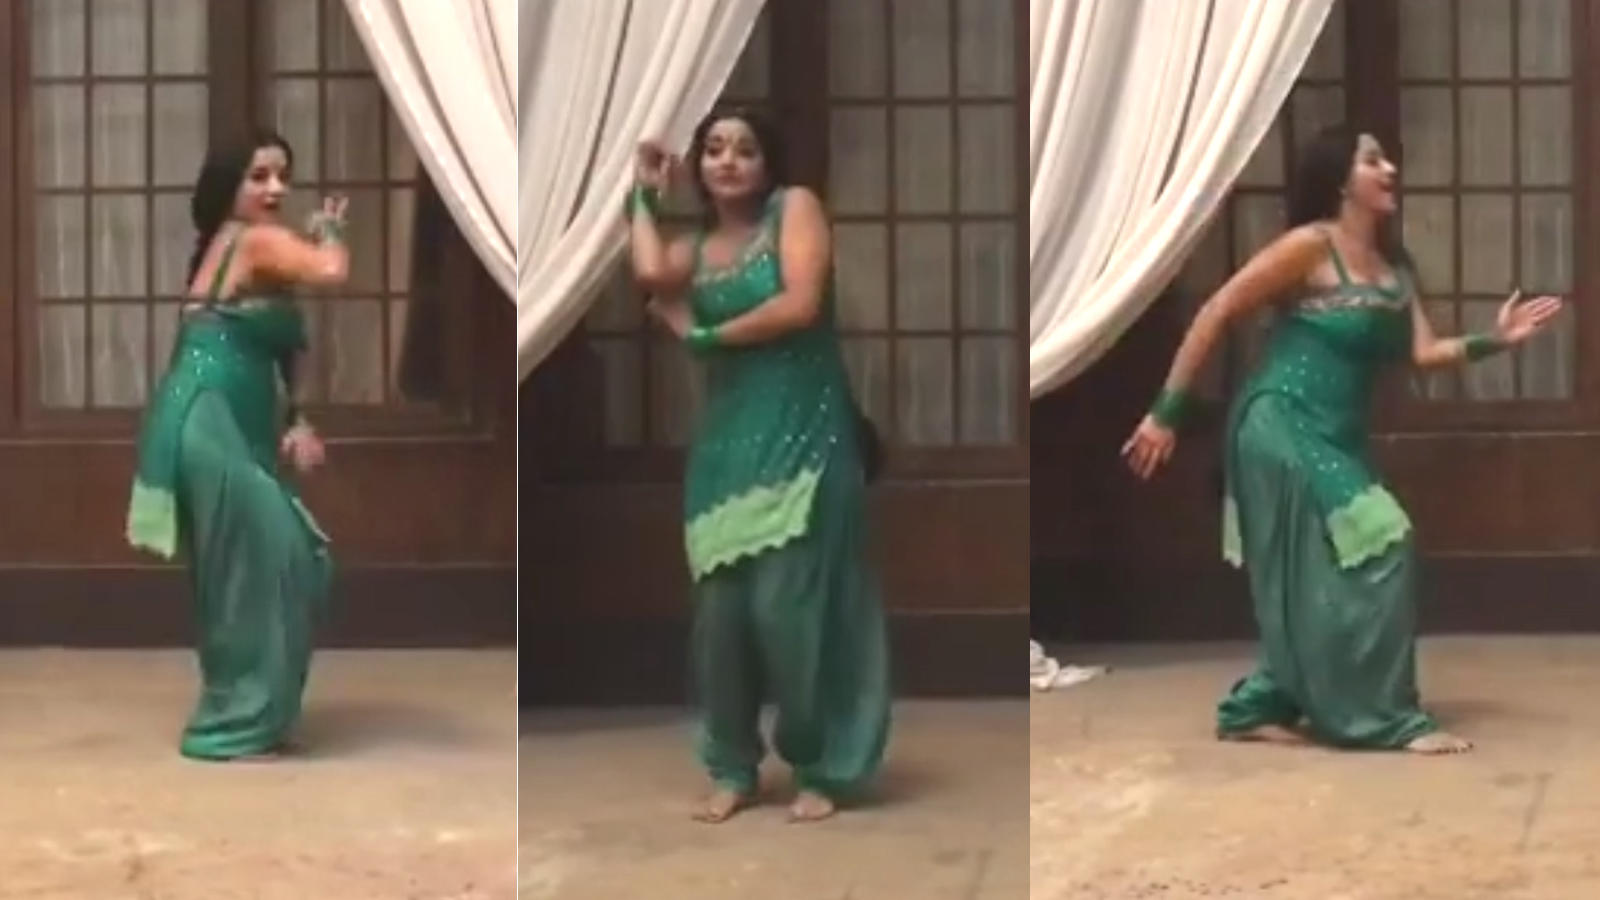 Bhojpuri sensation Monalisa's dancing video goes viral